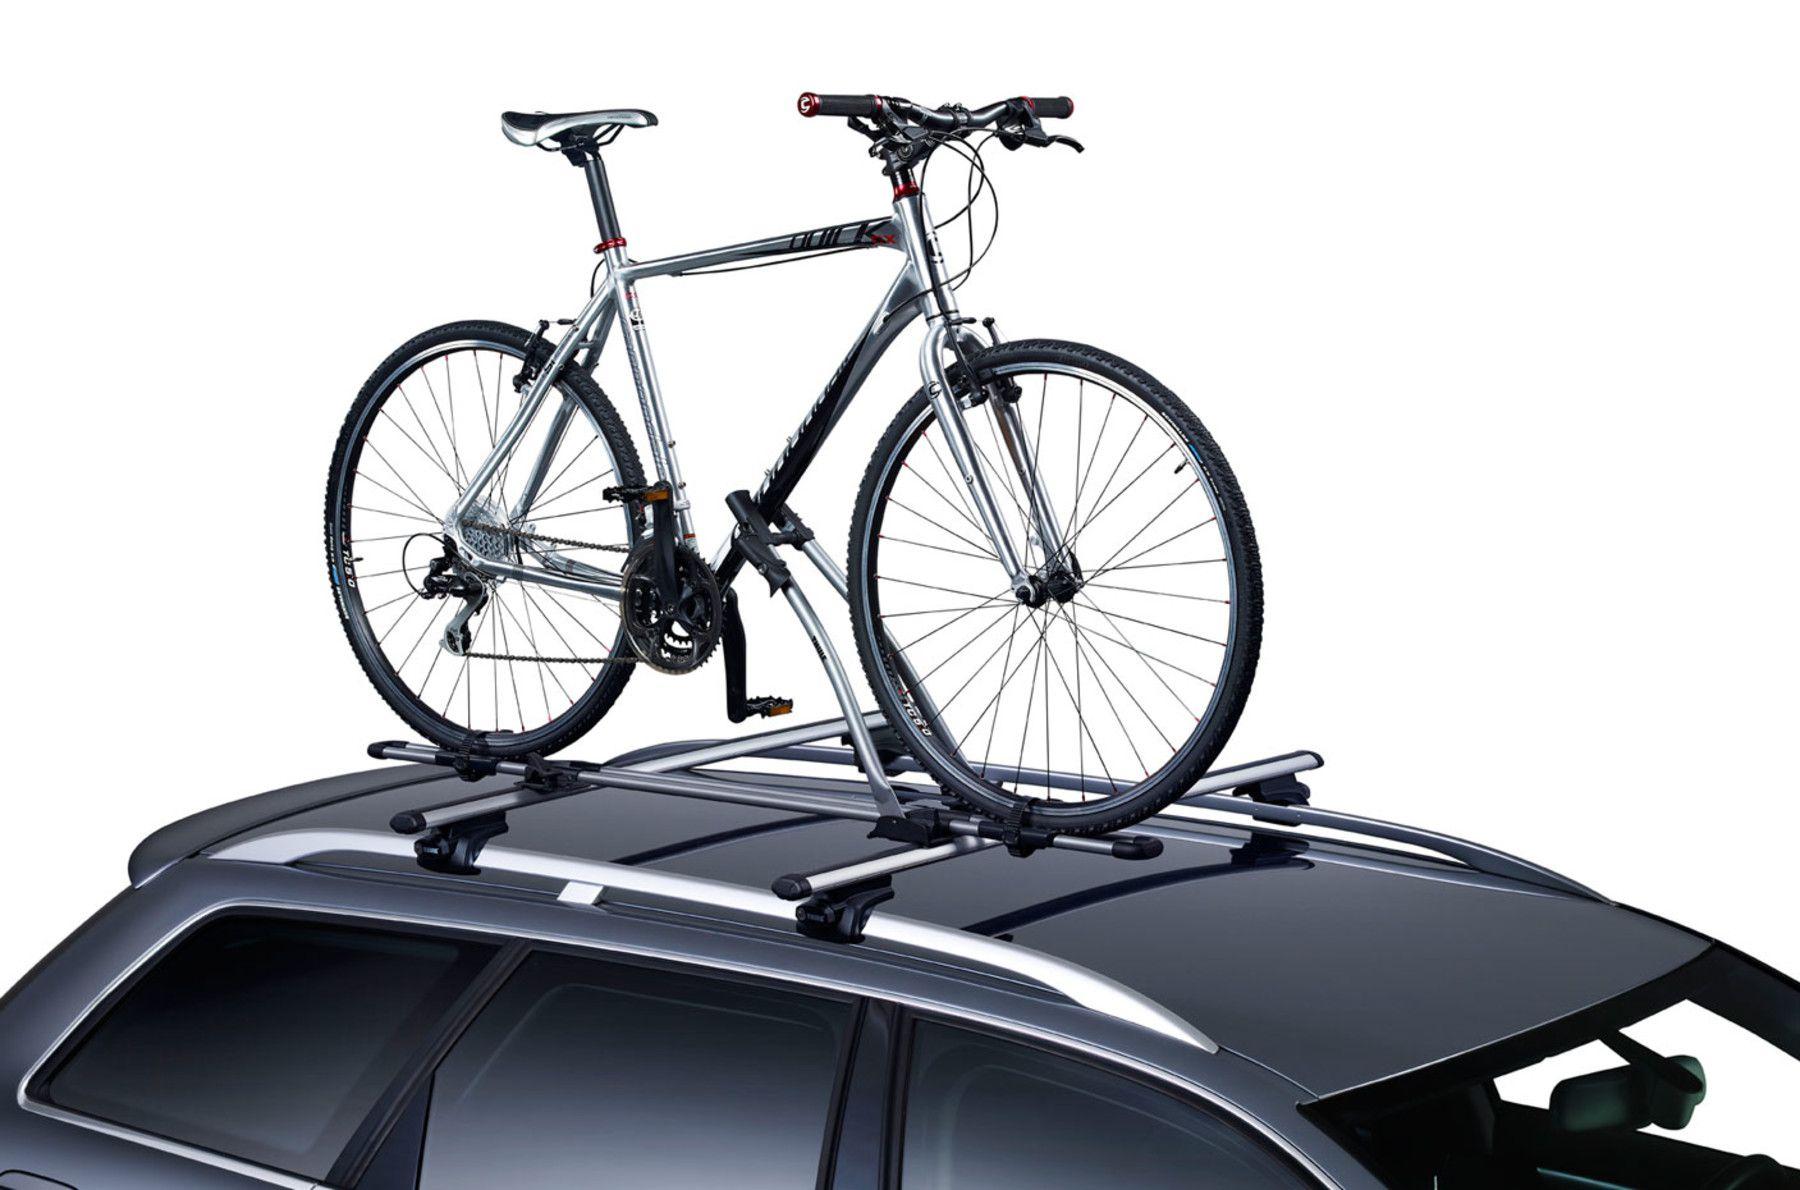 Suporte de Teto para Bicicleta Thule FreeRide